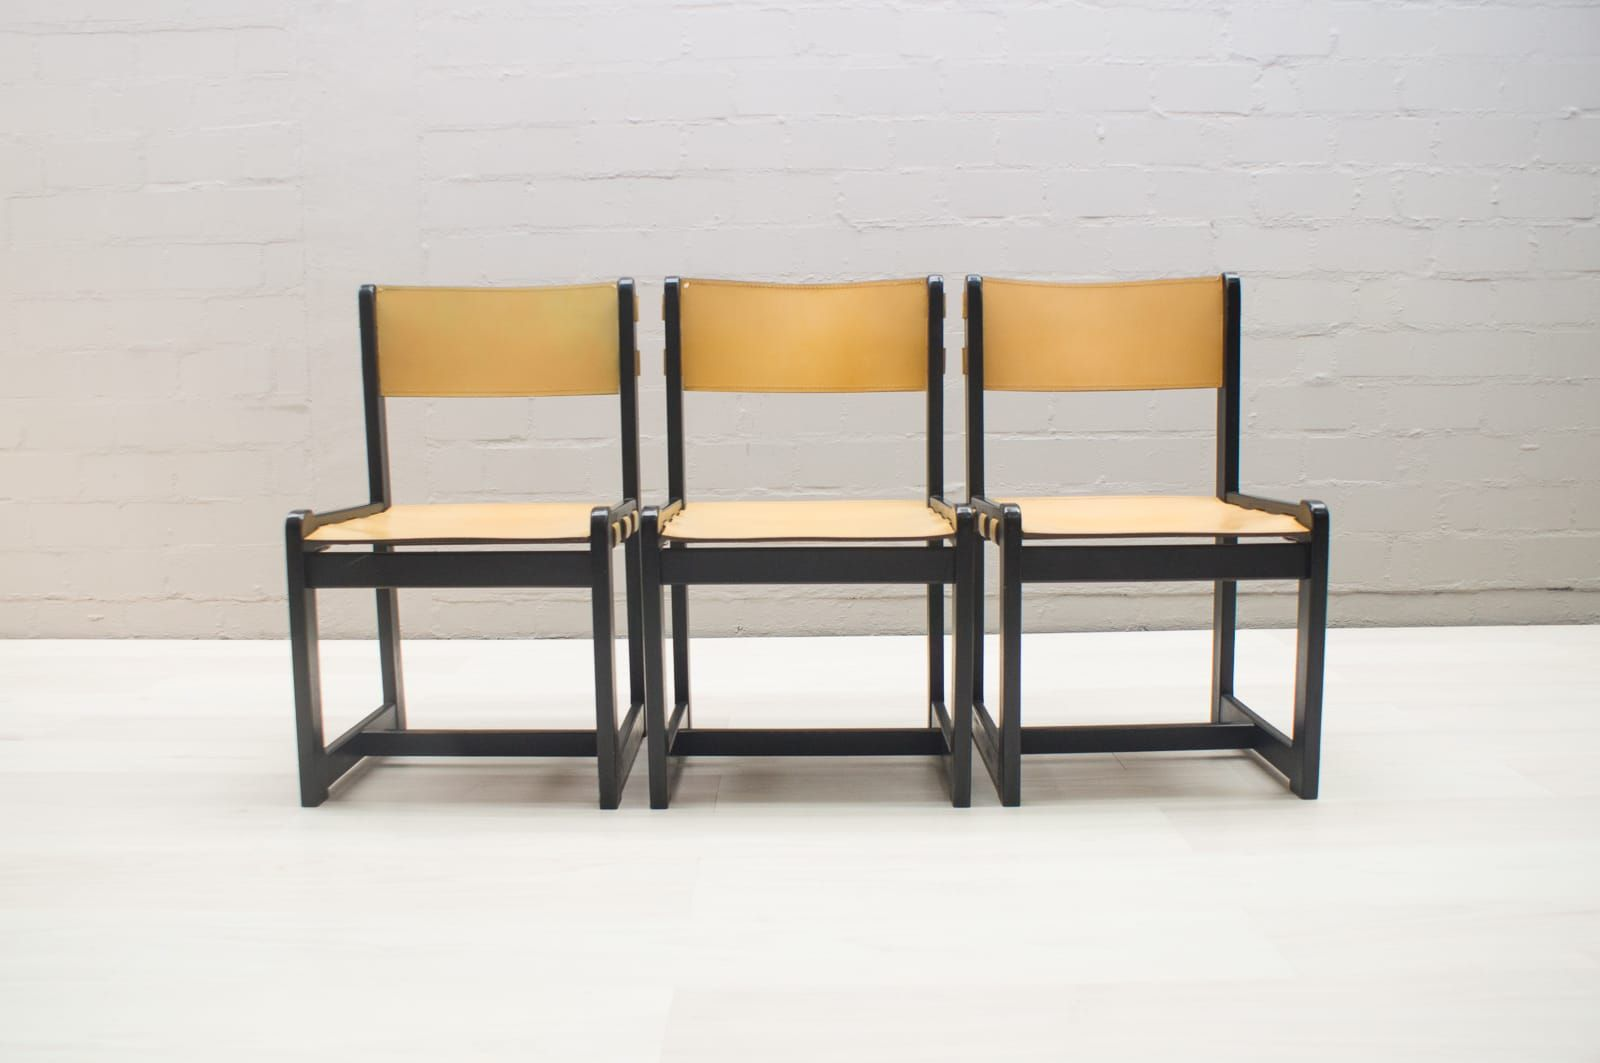 Sedie Vintage Pelle : Sedie vintage con sedute in pelle anni 60 set di 3 in vendita su